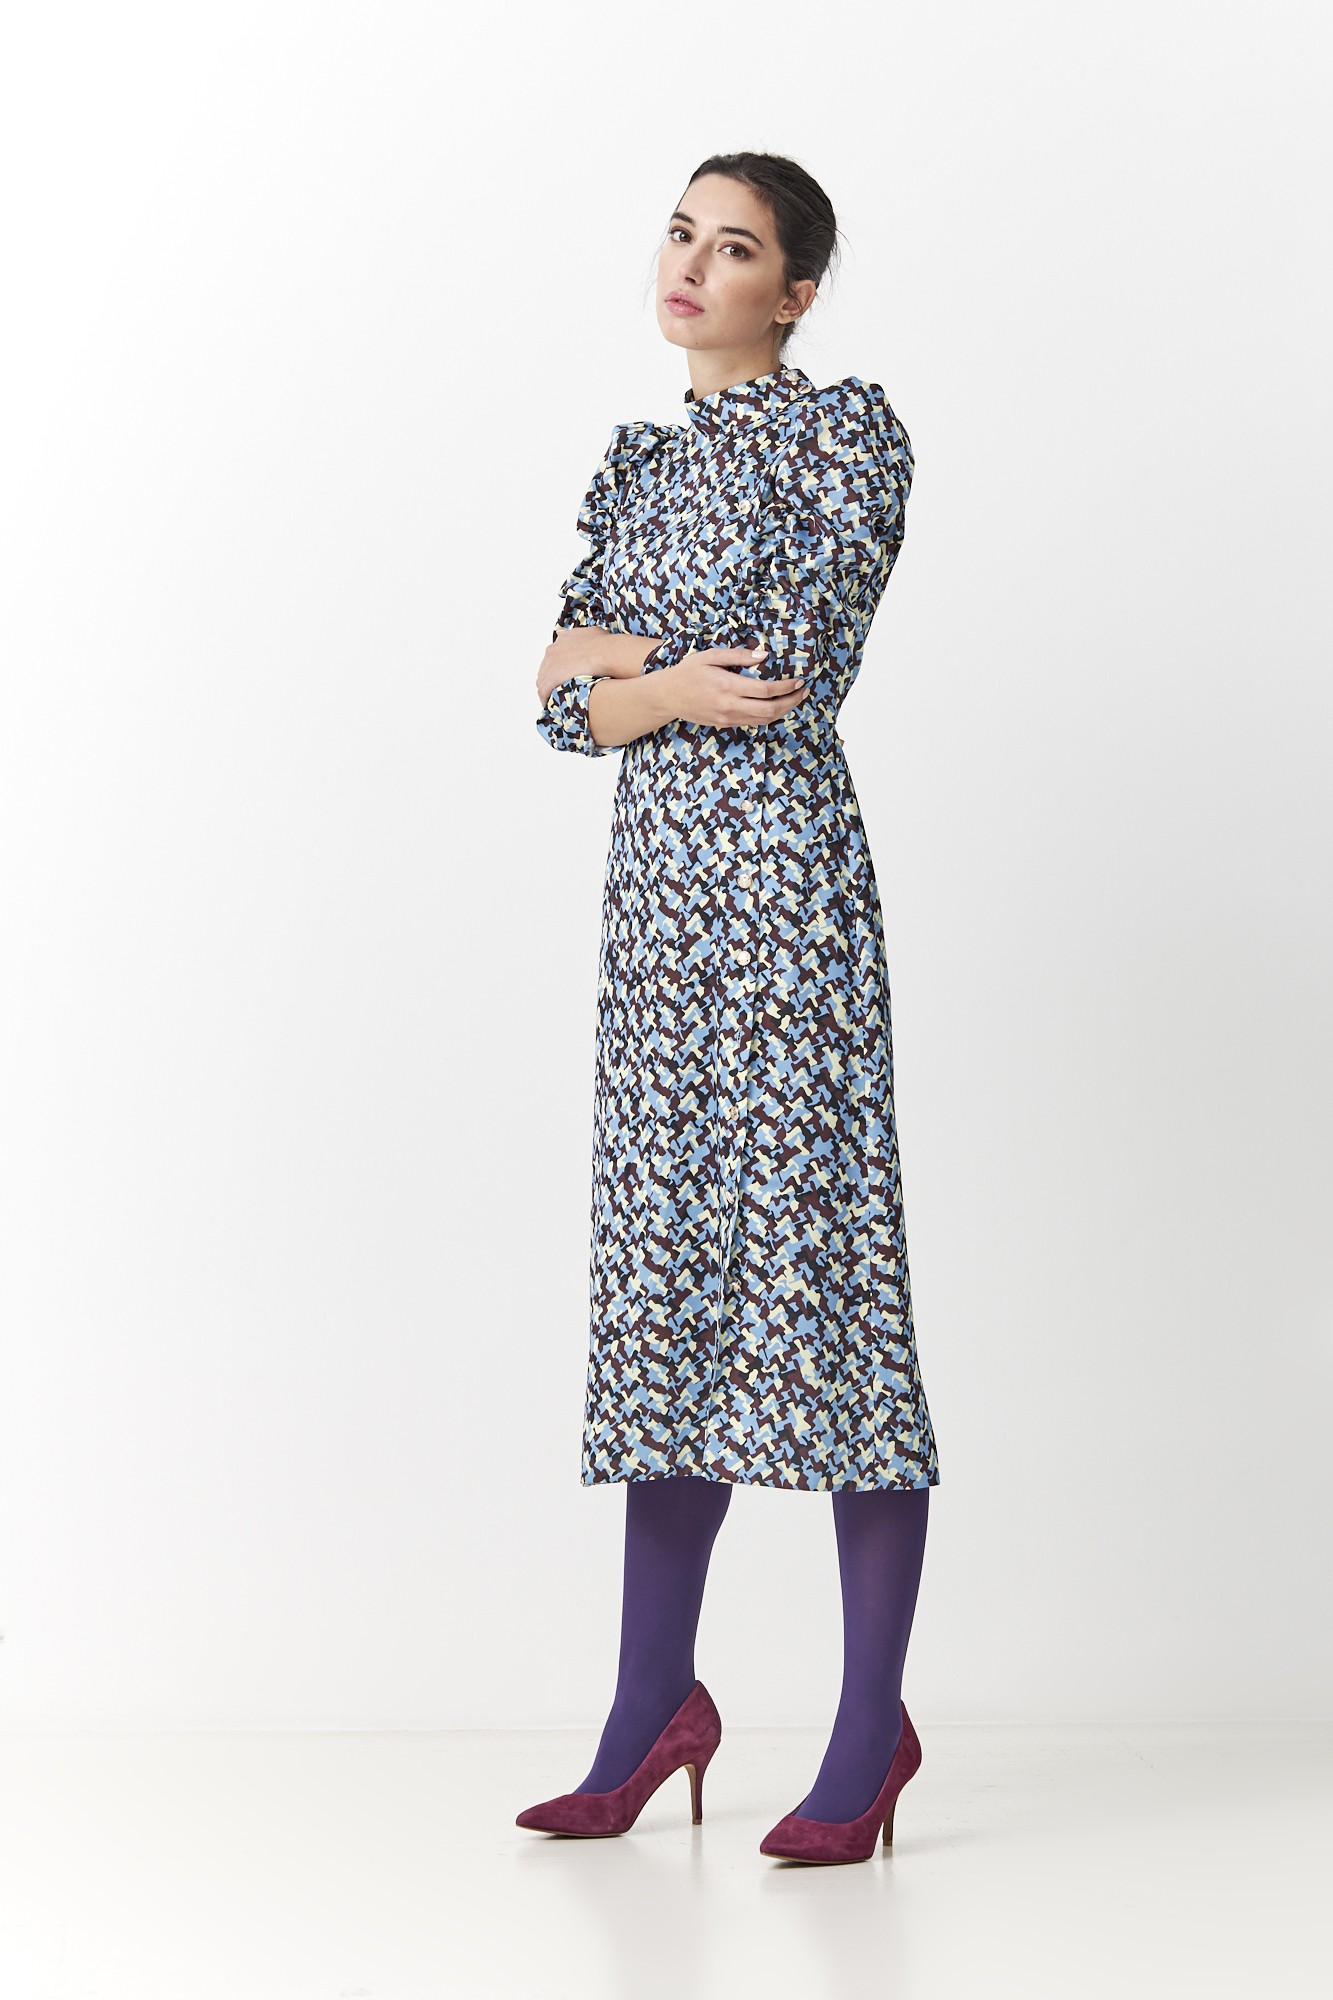 ROGER BLUE DRESS